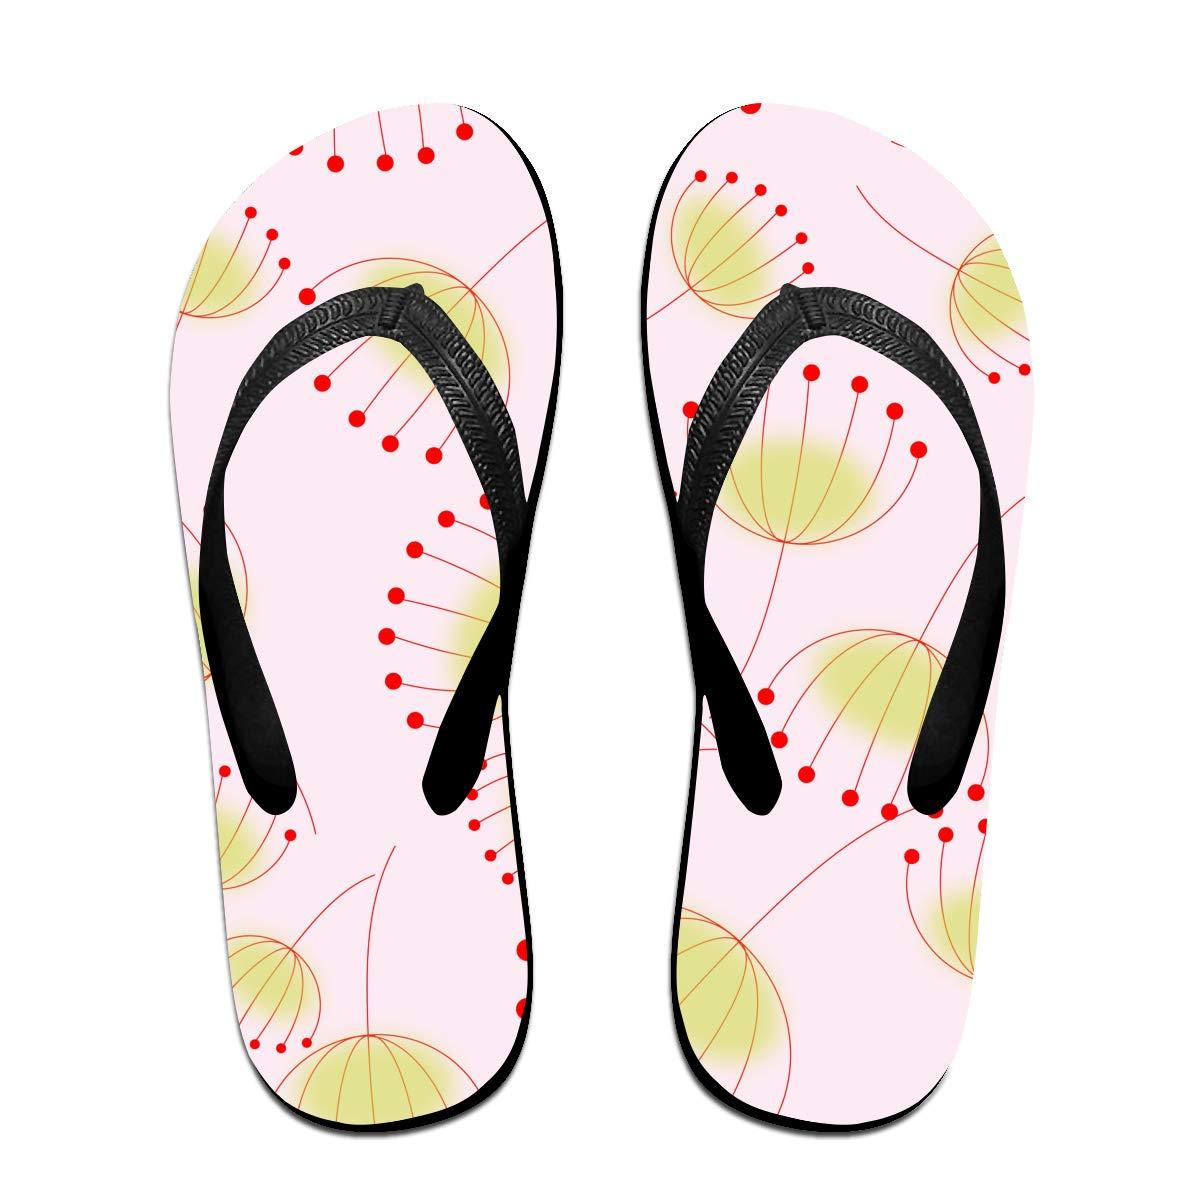 Lojaon Couple Slipper Dandelion Florals Print Flip Flops Unisex Chic Sandals Rubber Non-Slip Spa Thong Slippers